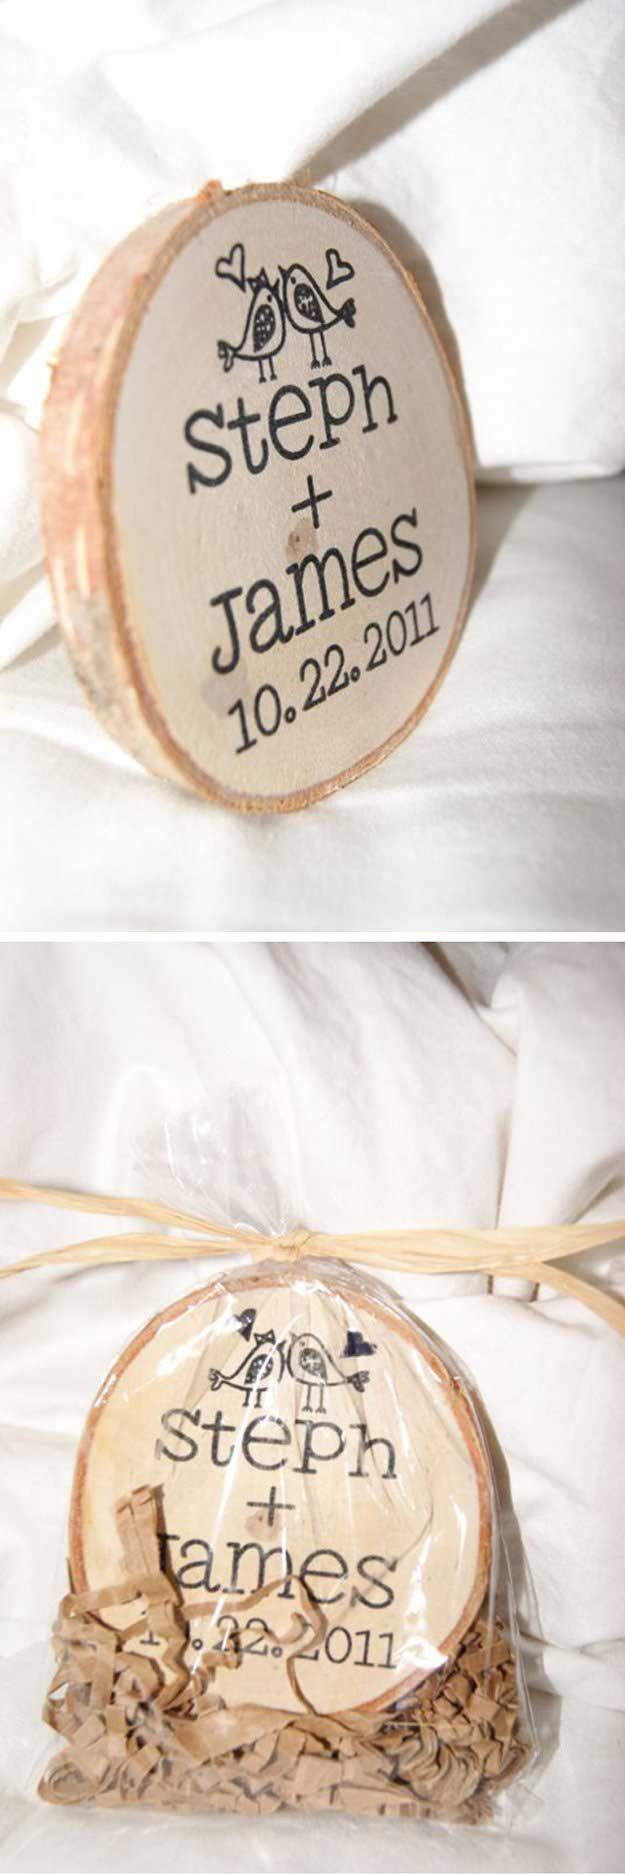 24 DIY Wedding Favor Ideas | DIY wedding, Favors and Weddings